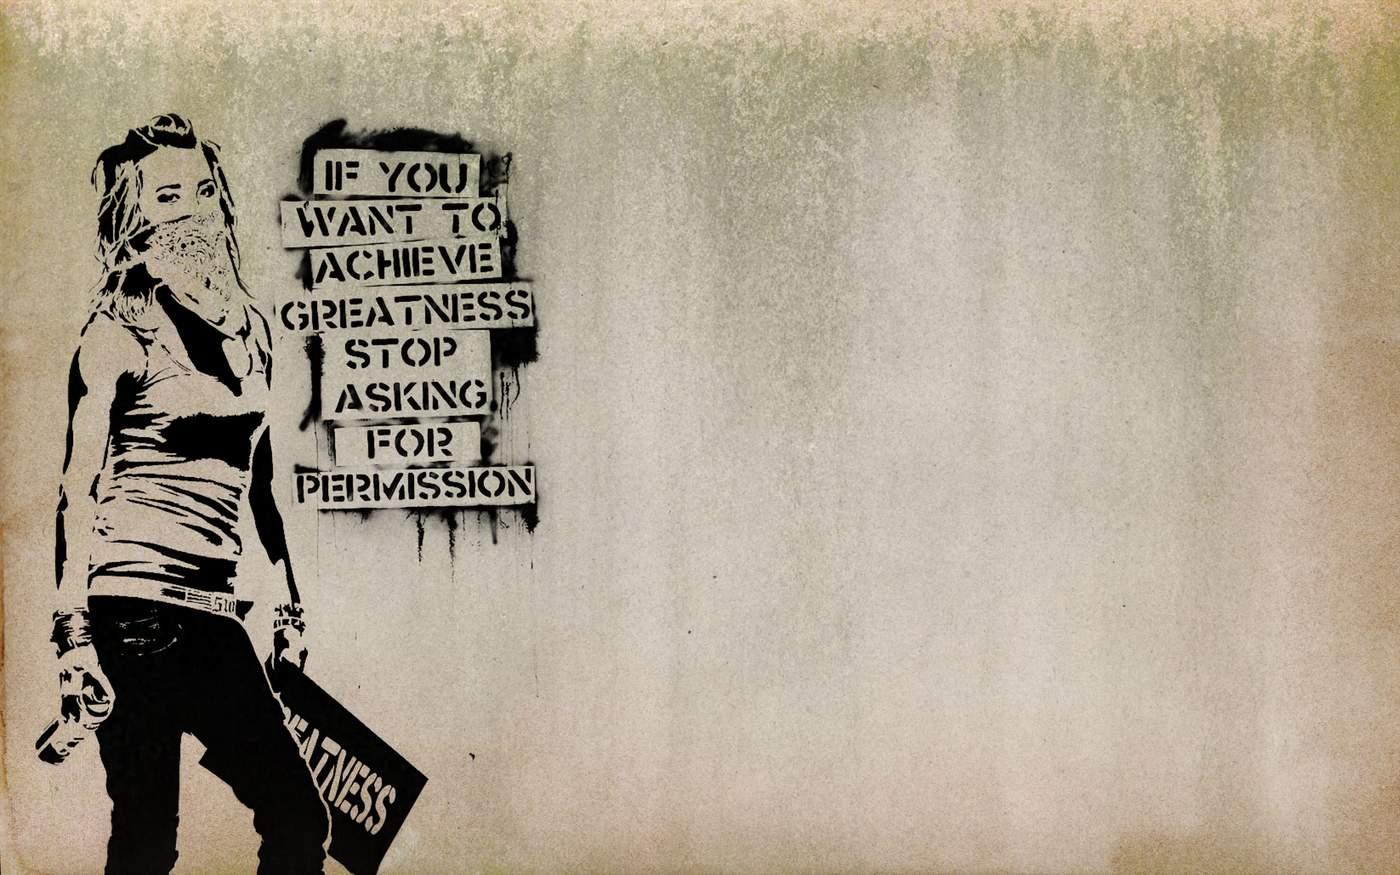 grootse dingen doe je zonder toestemming